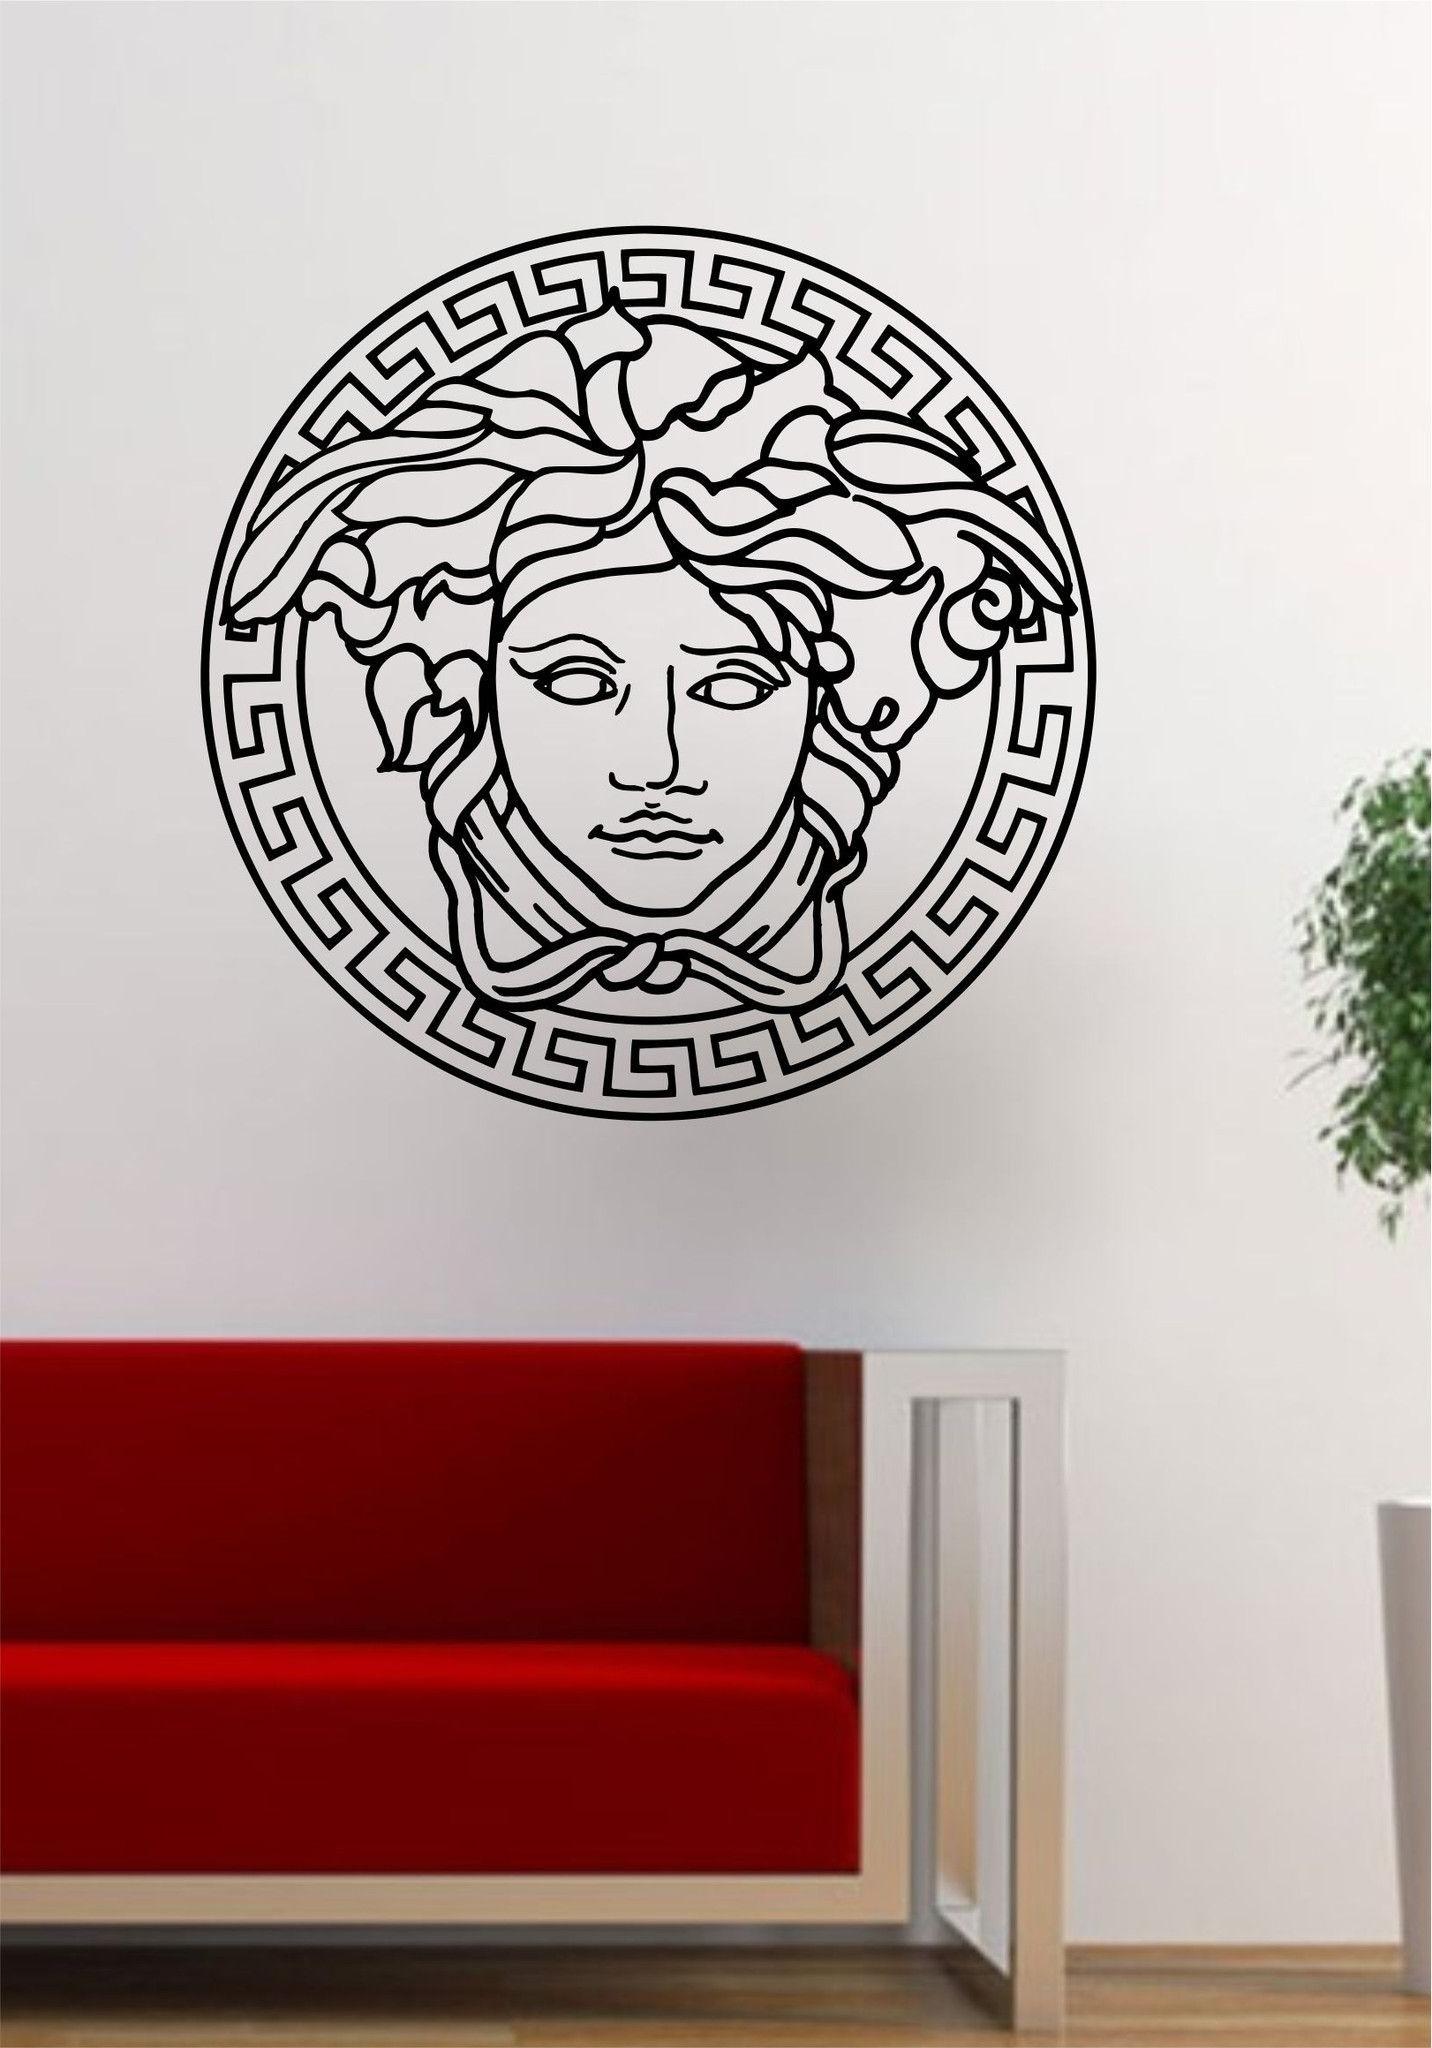 Versace Logo Medusa Decal Sticker Wall Vinyl Decor Art (Gallery 1 of 15)